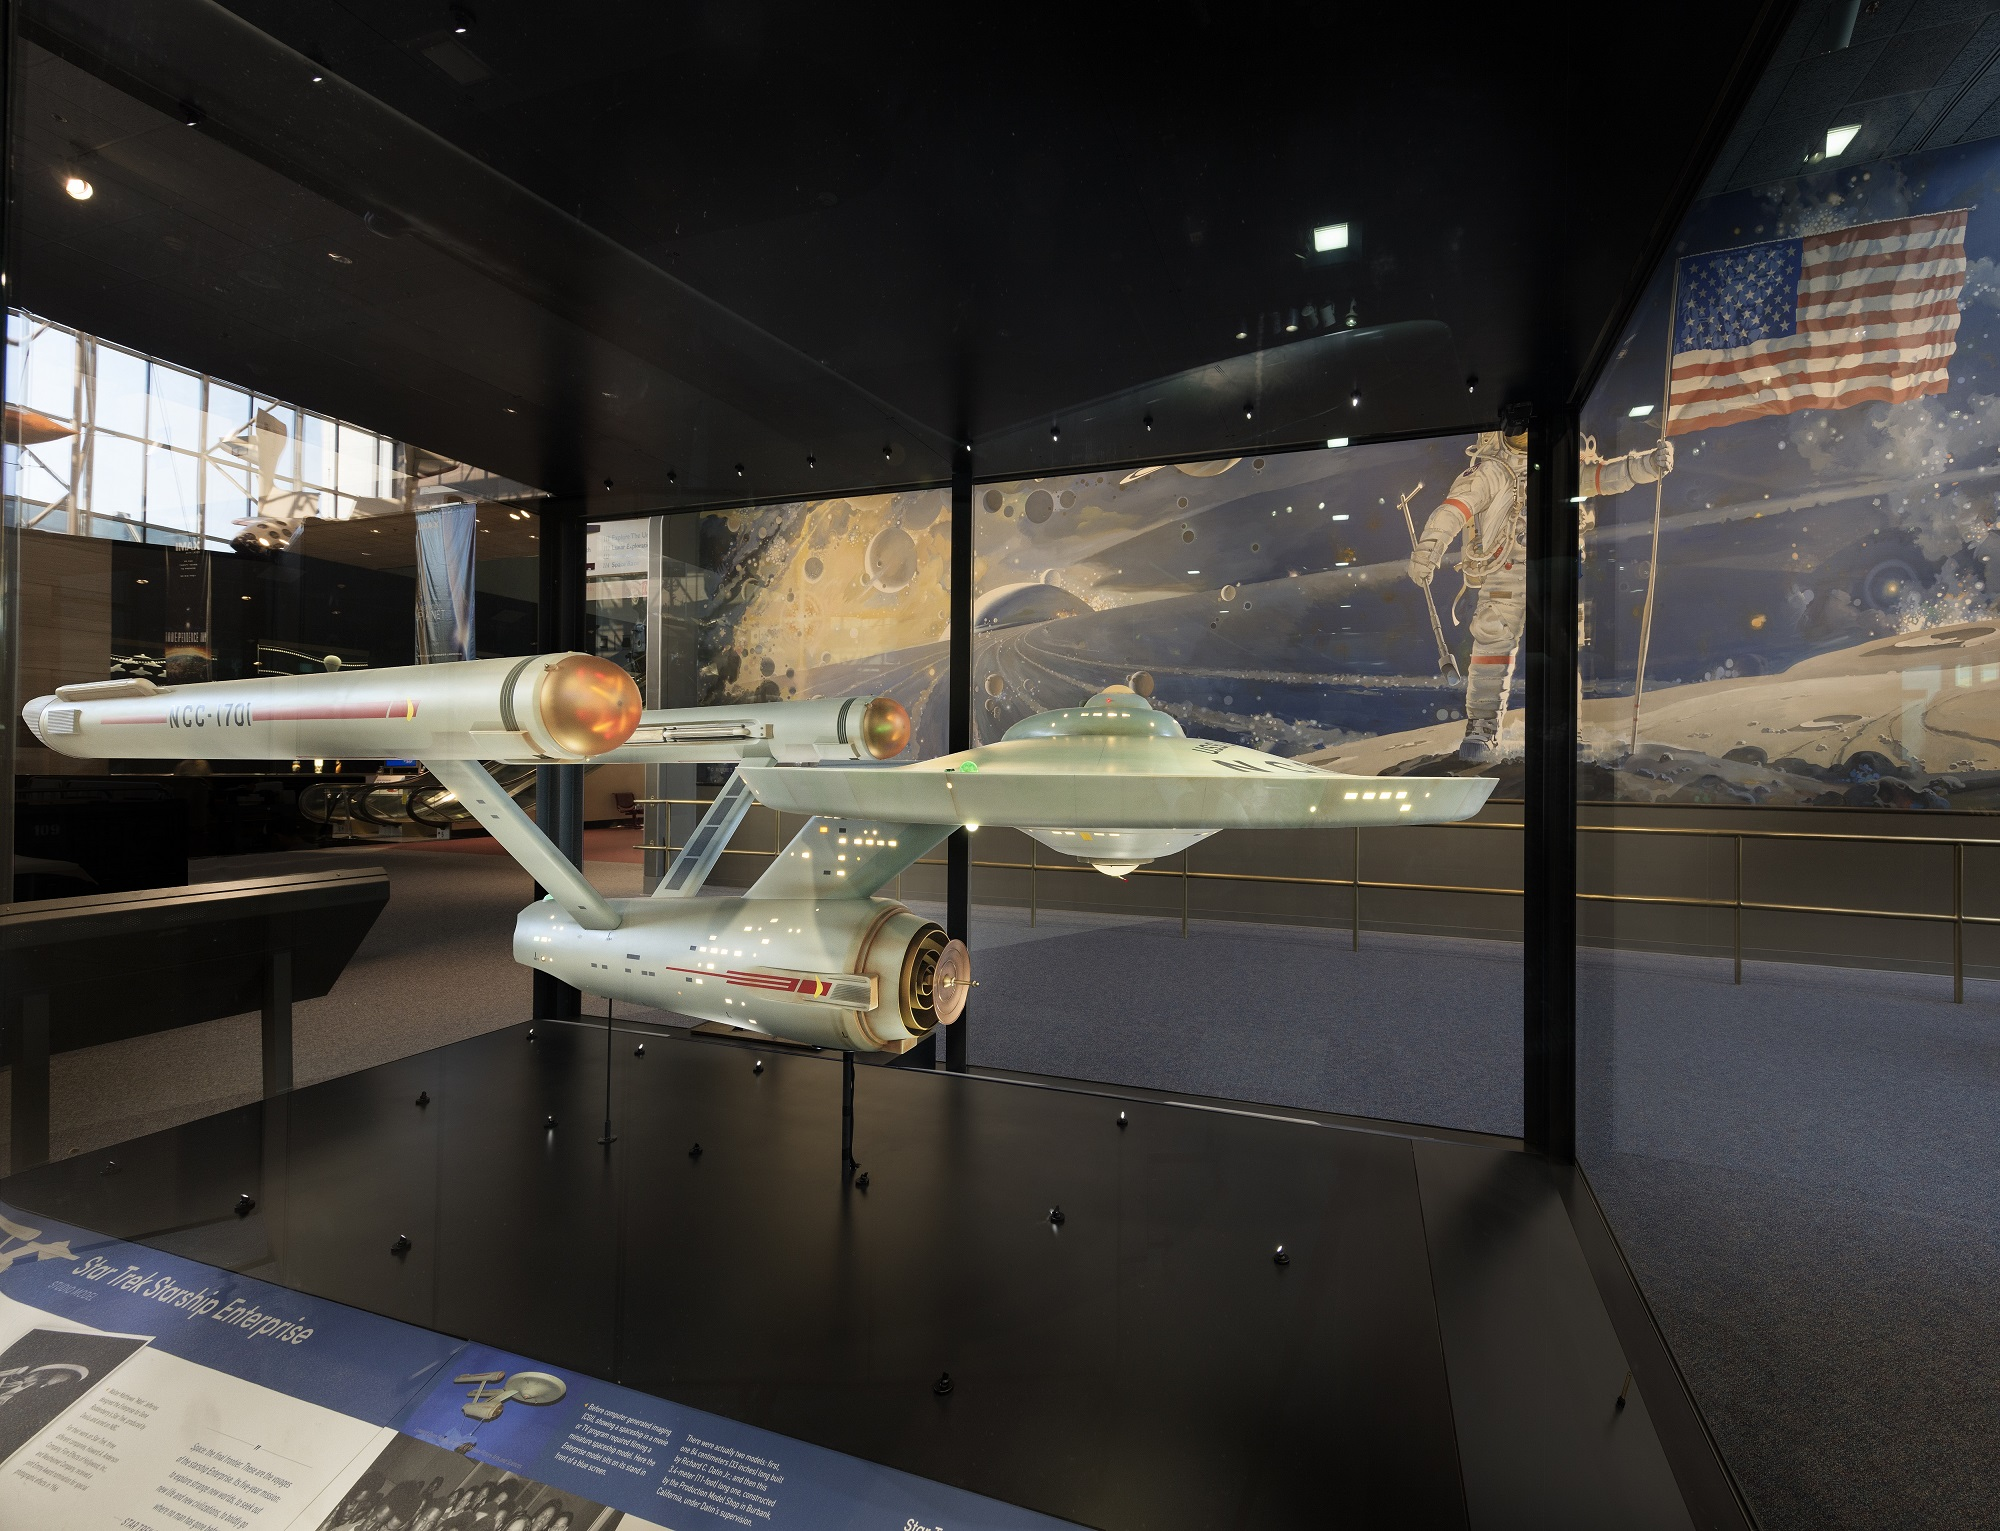 'Building Star Trek' Doc Celebrates TV Series' Tech Legacy